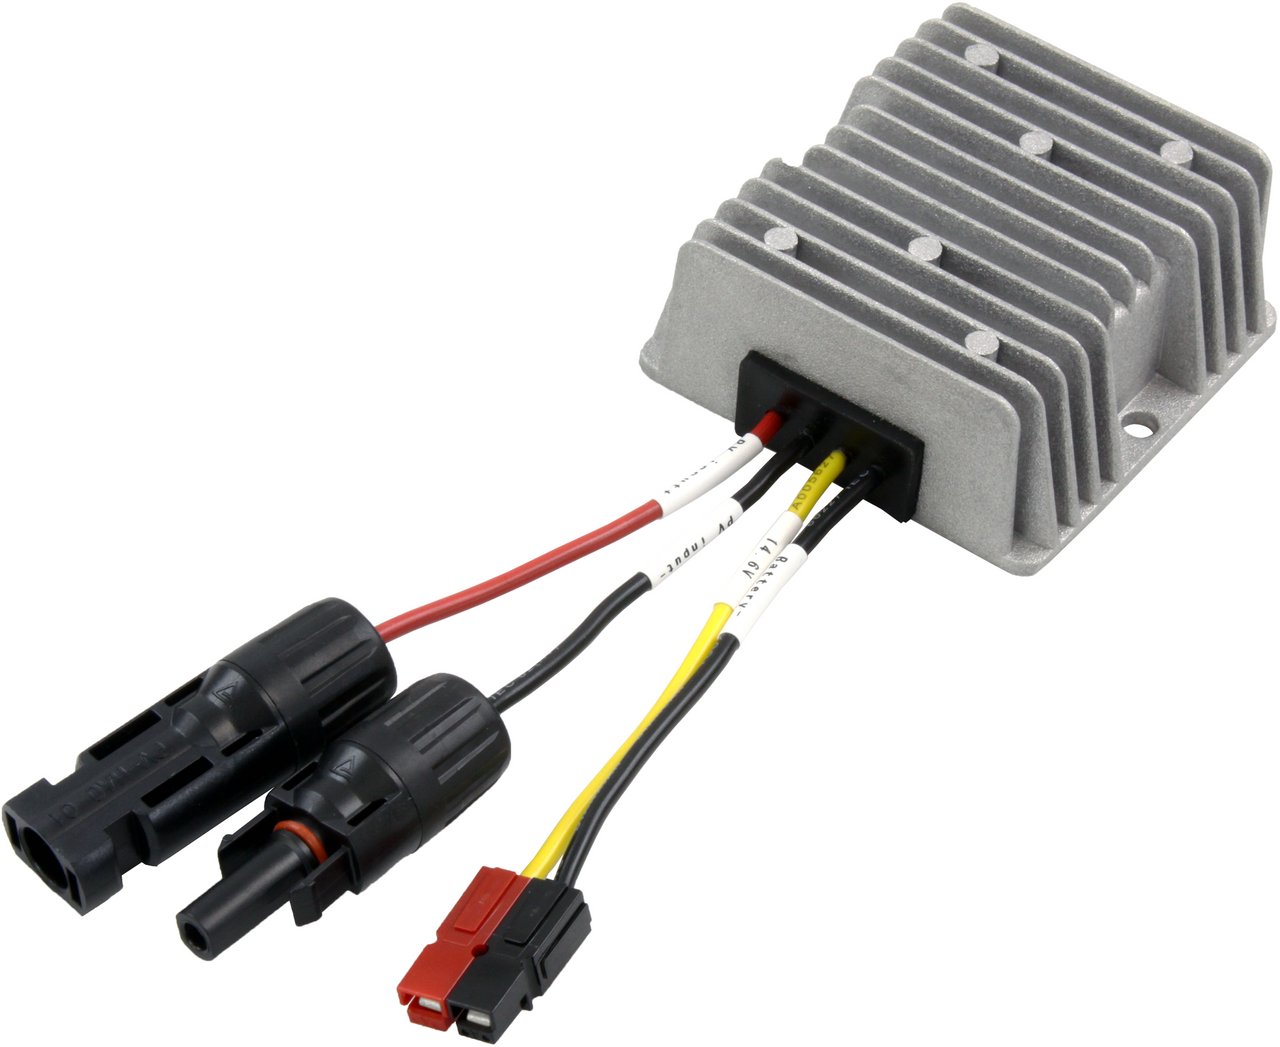 Powerwerx MPPT 300 Watt Solar Charge Controller for LiFePO4 Batteries, MC4